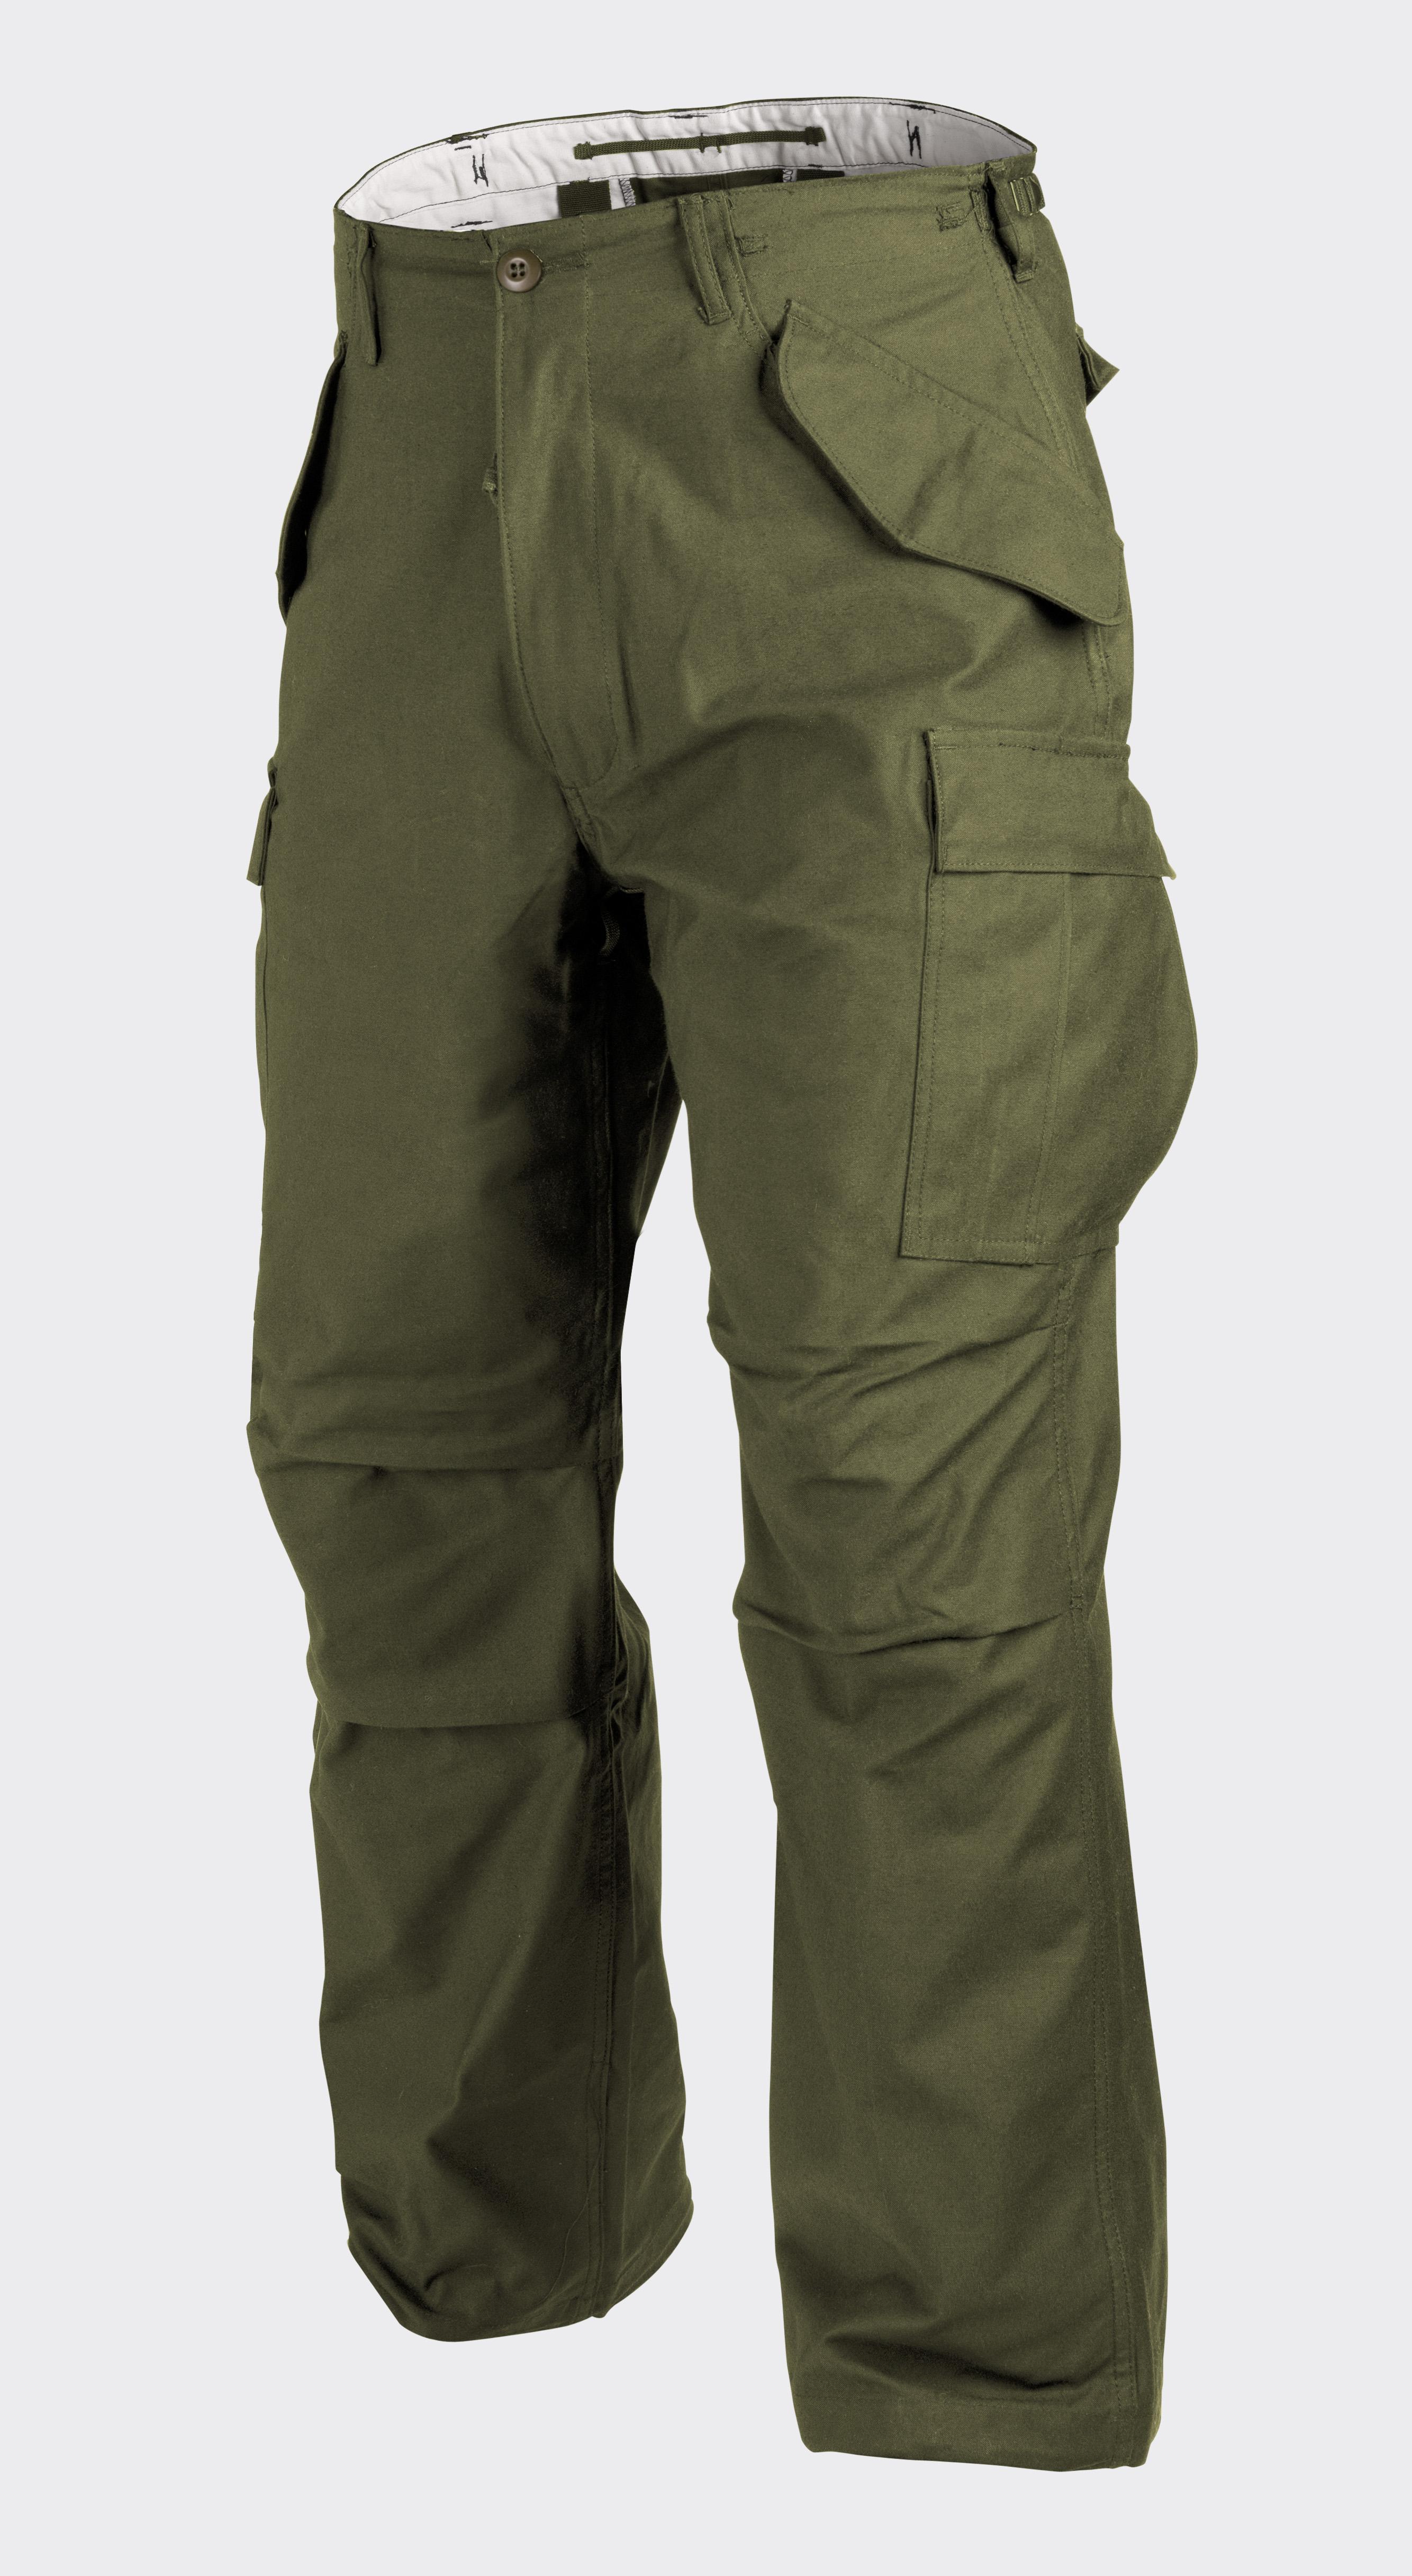 Spodnie m65 kolor OlivHelikon-tex